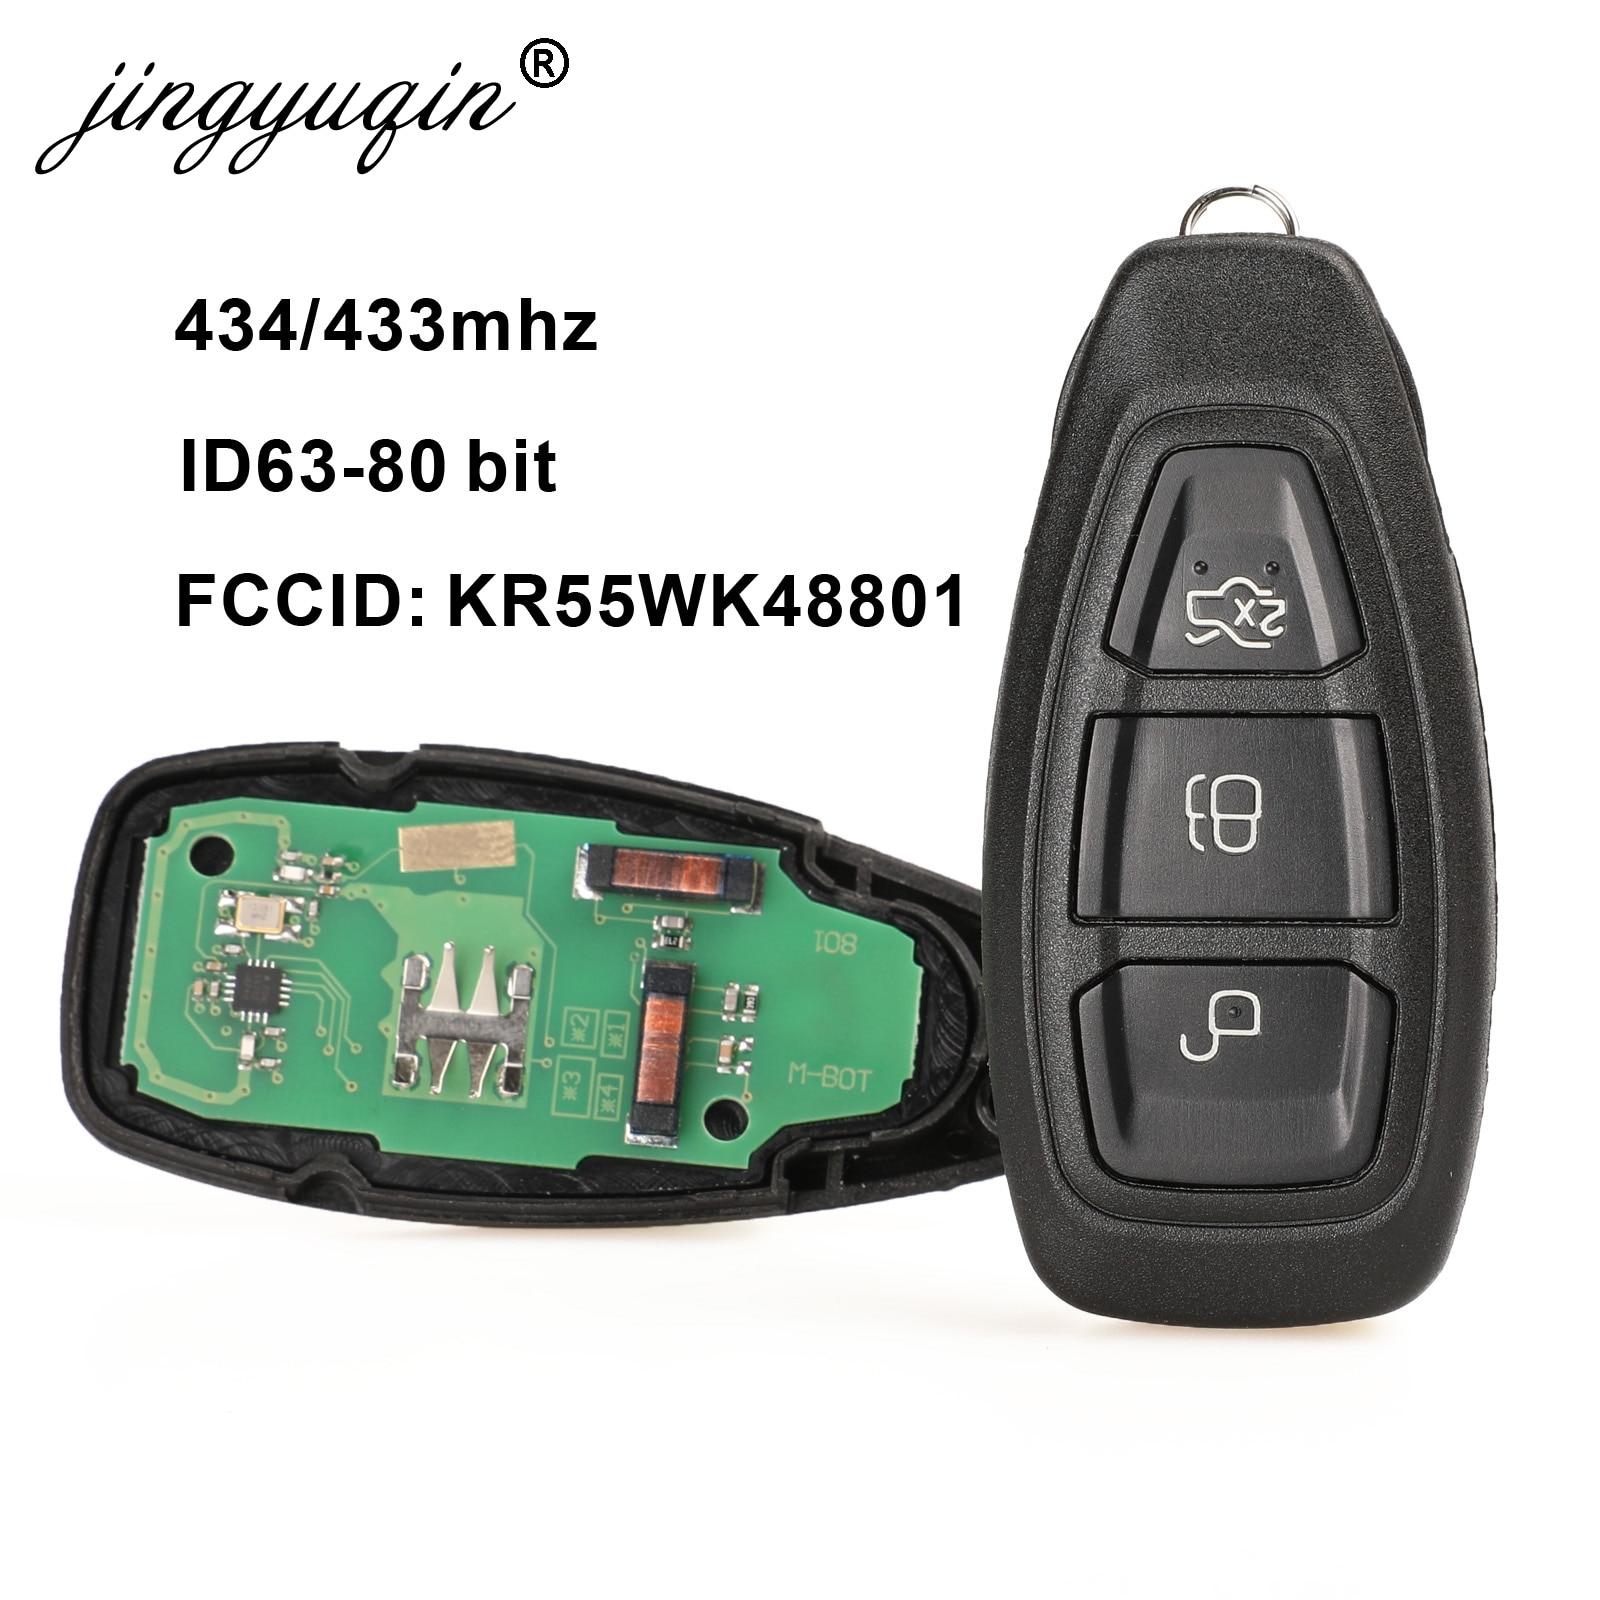 Умный дистанционный ключ jingyuqin KR55WK48801 для Ford Focus C-Max Mondeo Kuga Fiesta B-Max 433/434 МГц 4D63 80 бит, без ключа